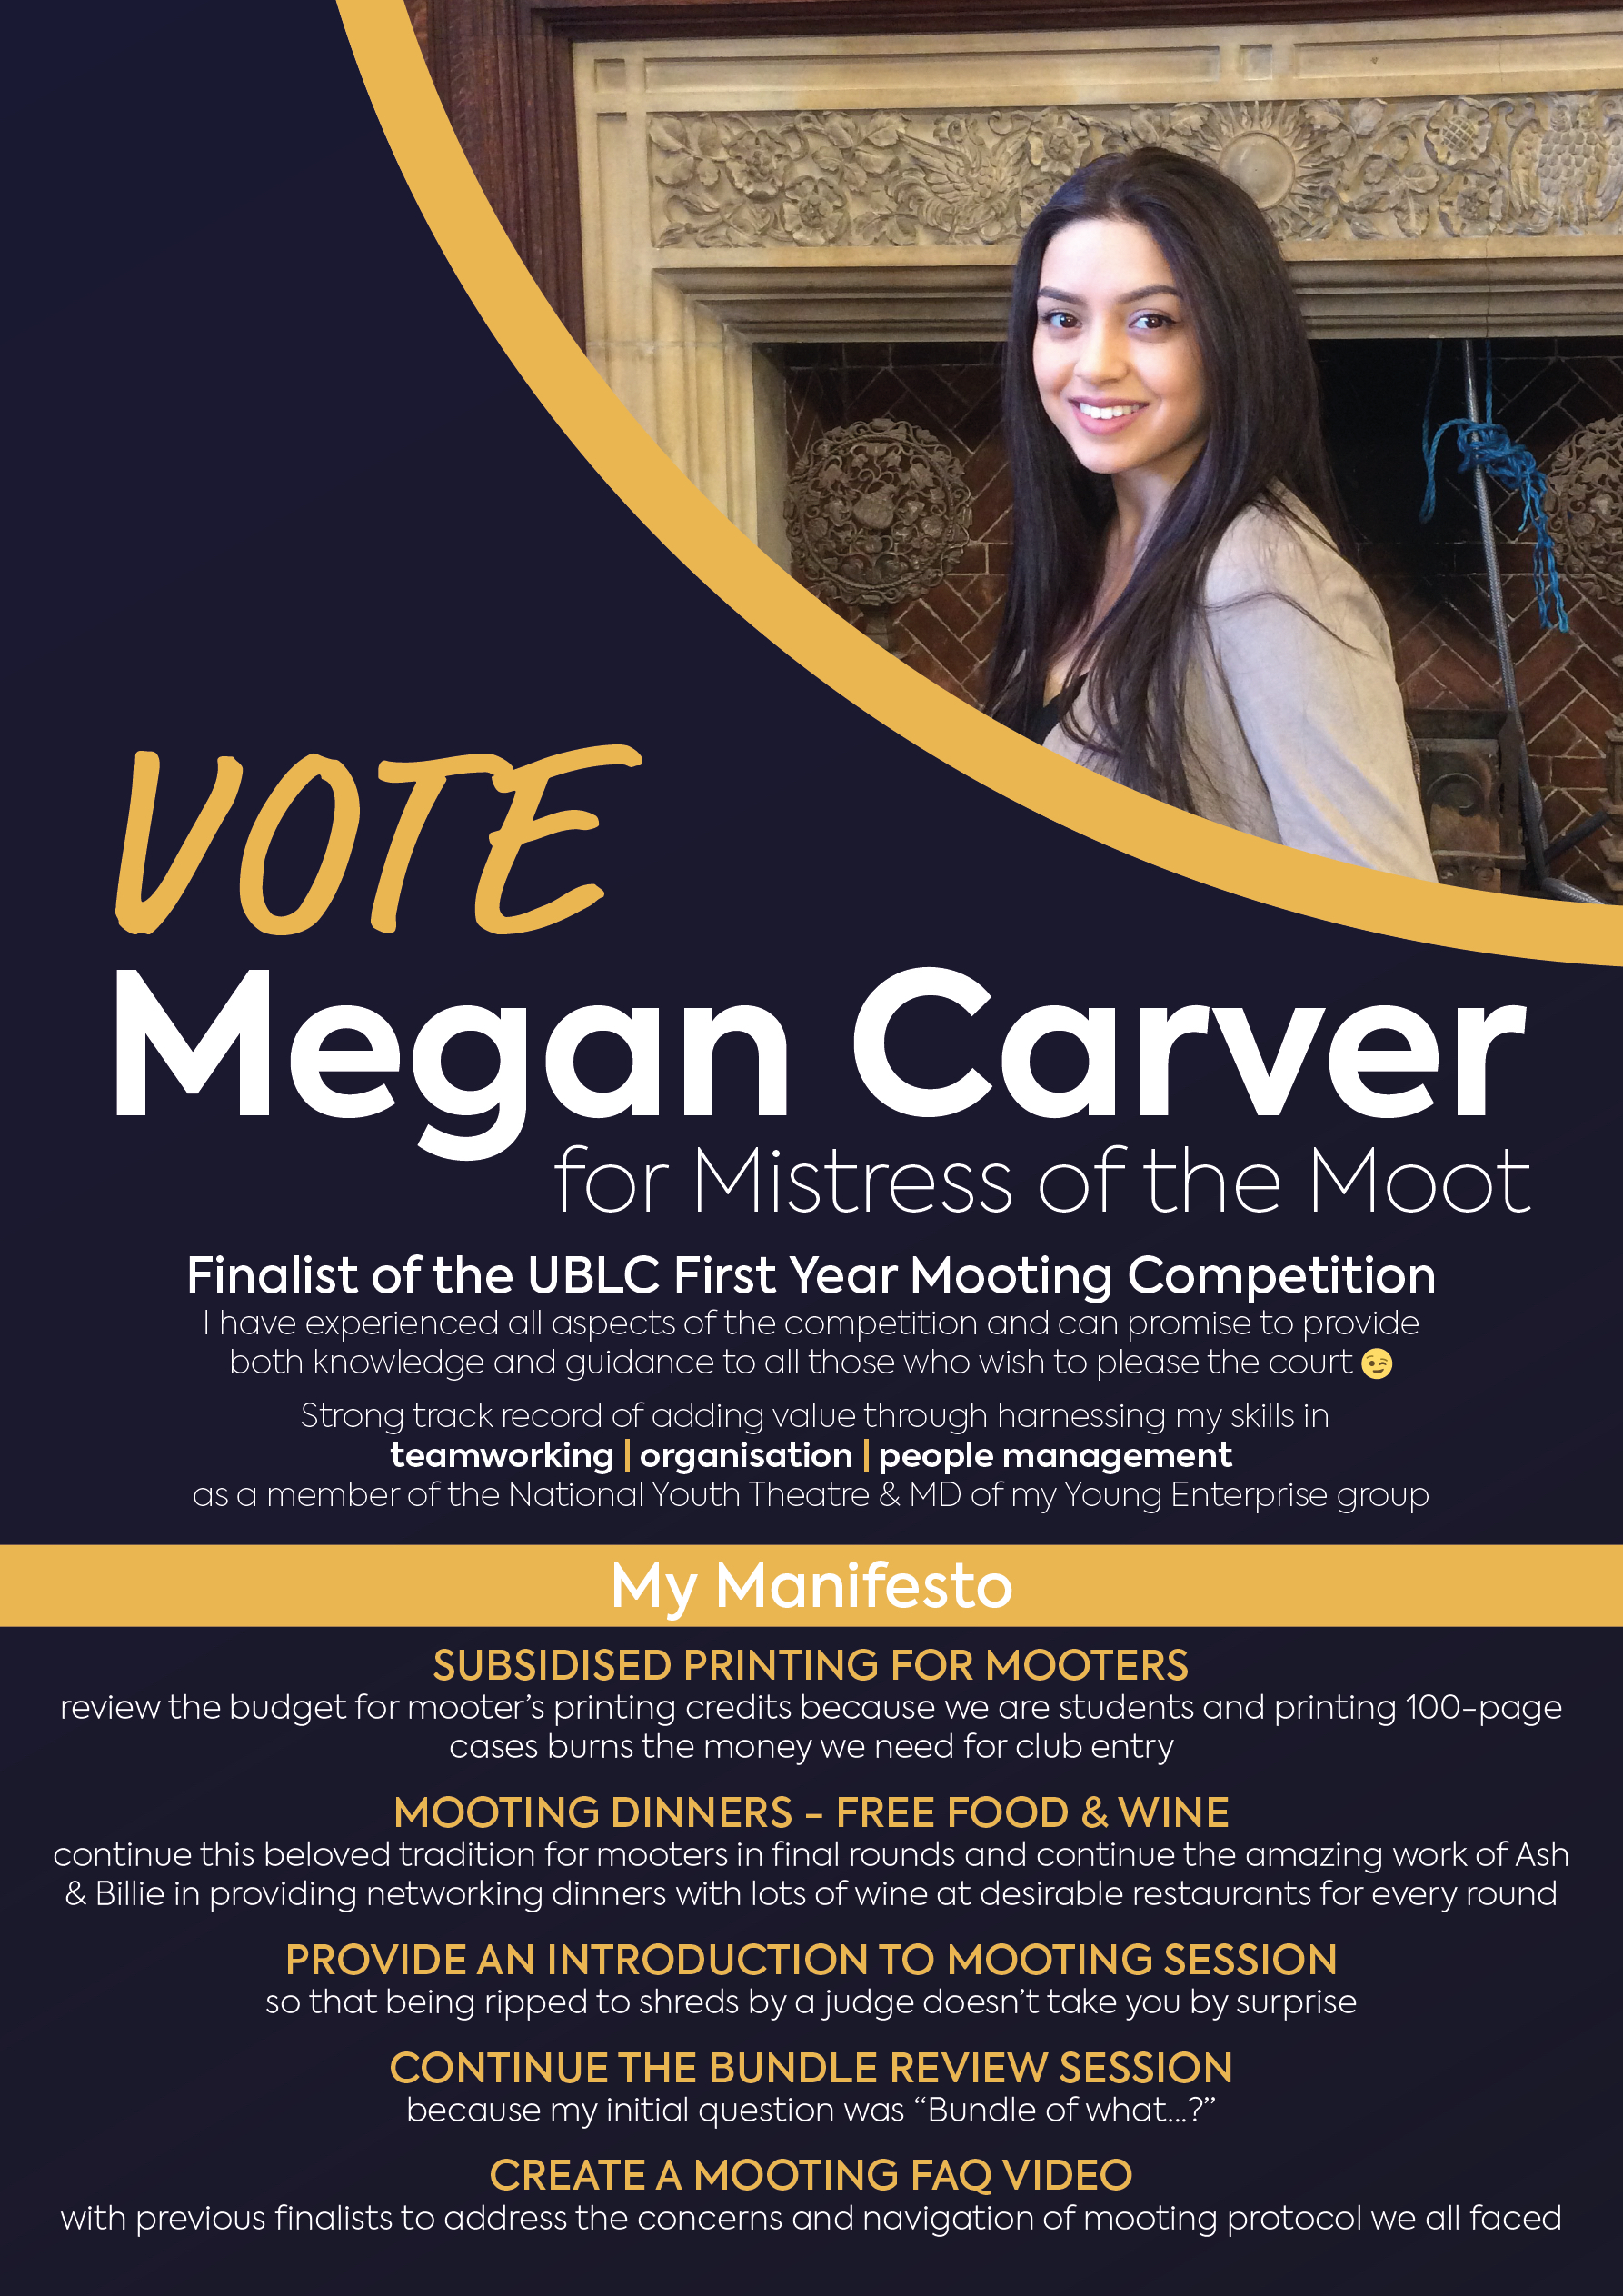 Megan_sManifesto - Megan Carver.jpg